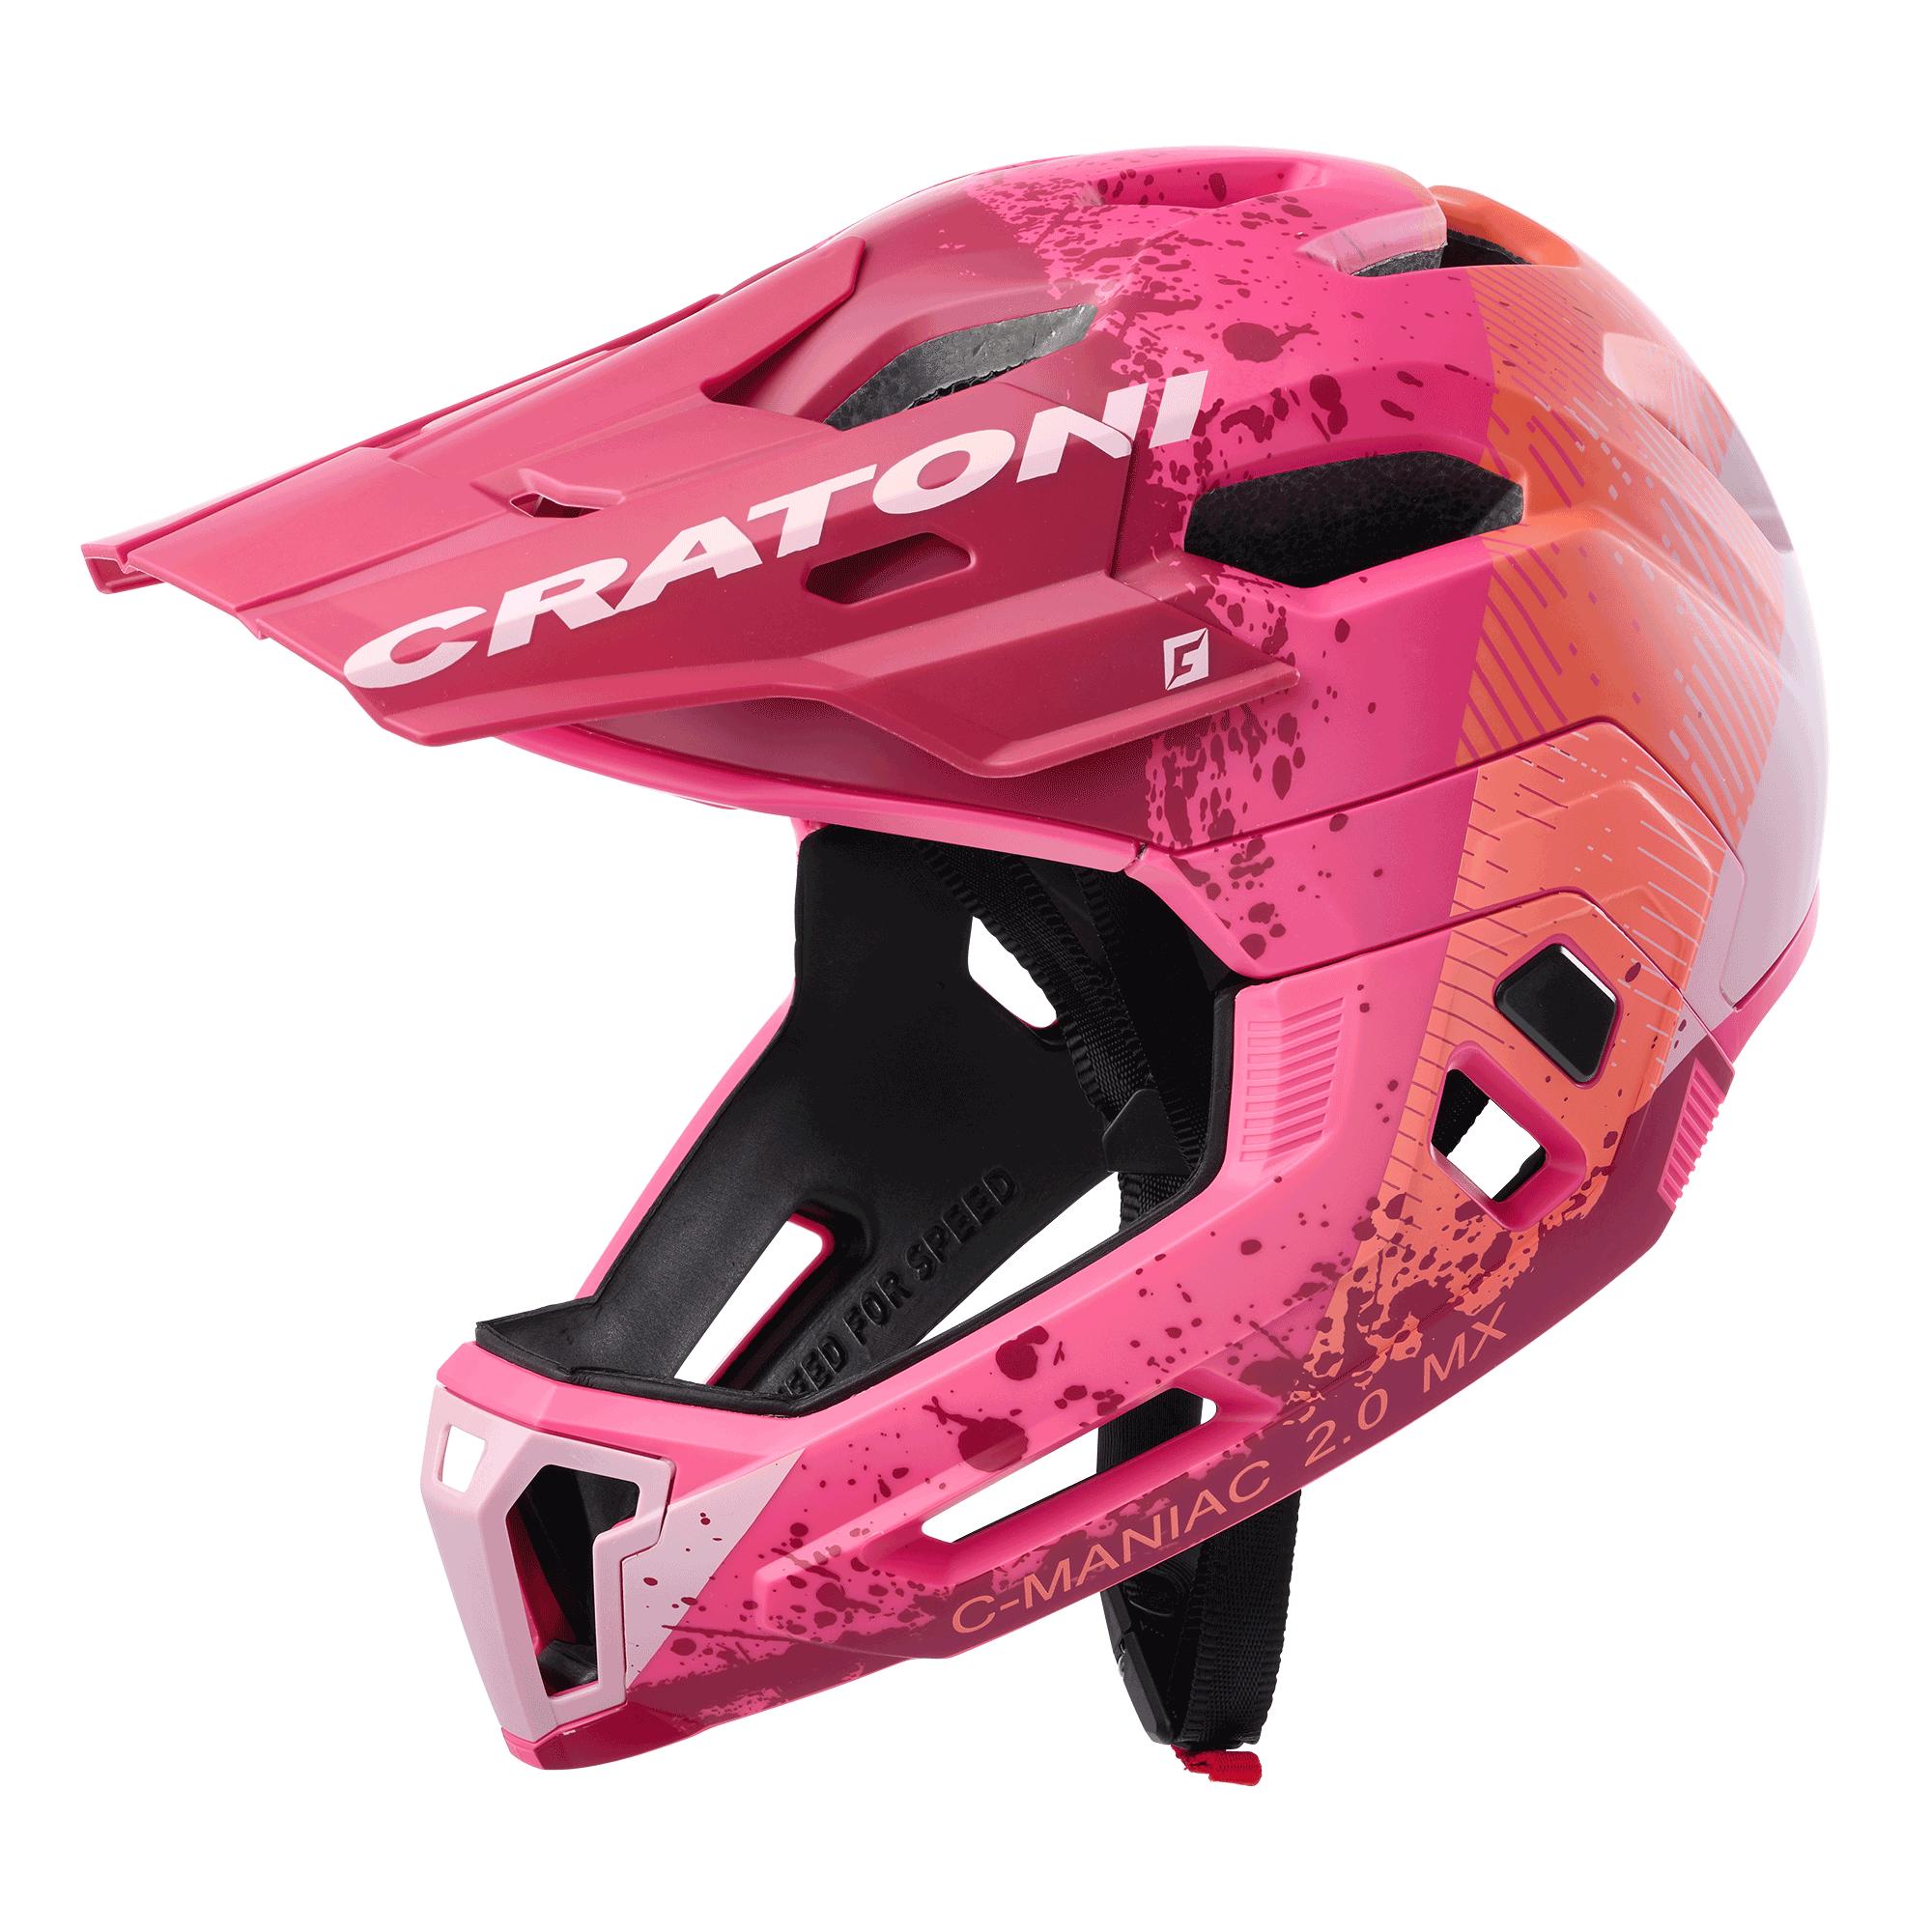 C-Maniac 2.0 MX pink-orange matt